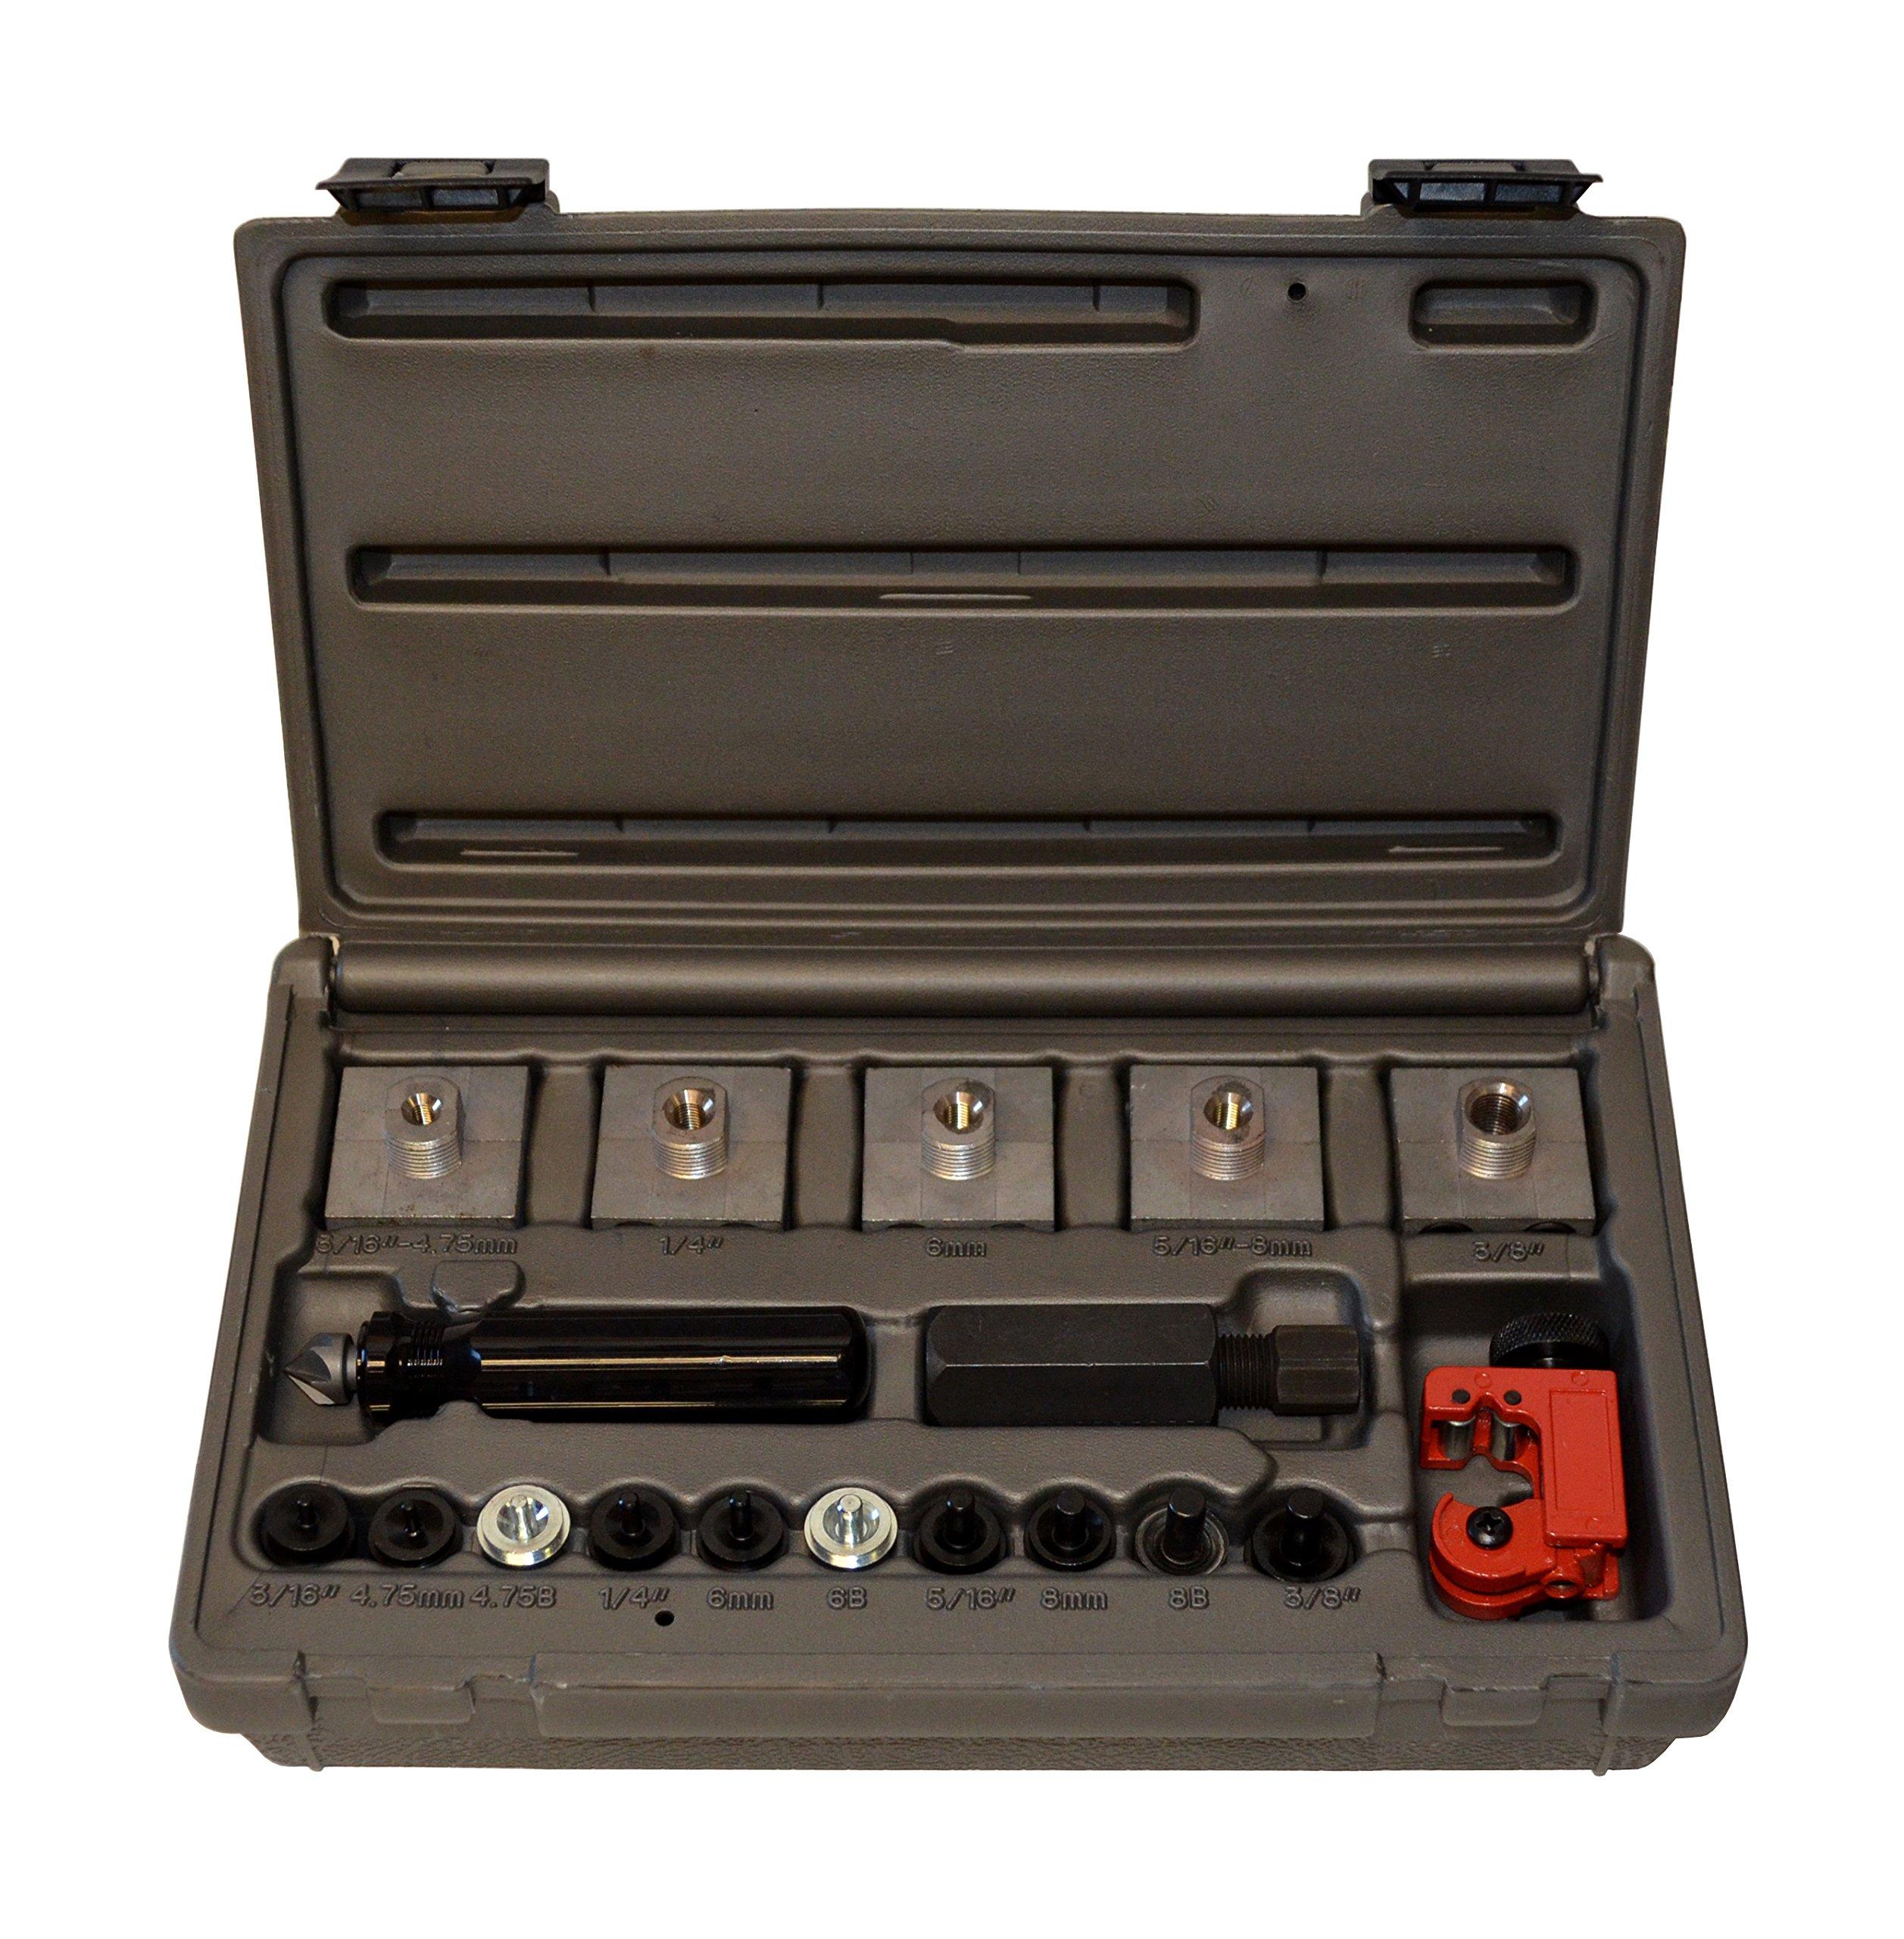 Cal-Van Tools 165 Master Inline Flaring Kit - Double and Single Flares, Brake Flaring Tools. Professional Tool Kit